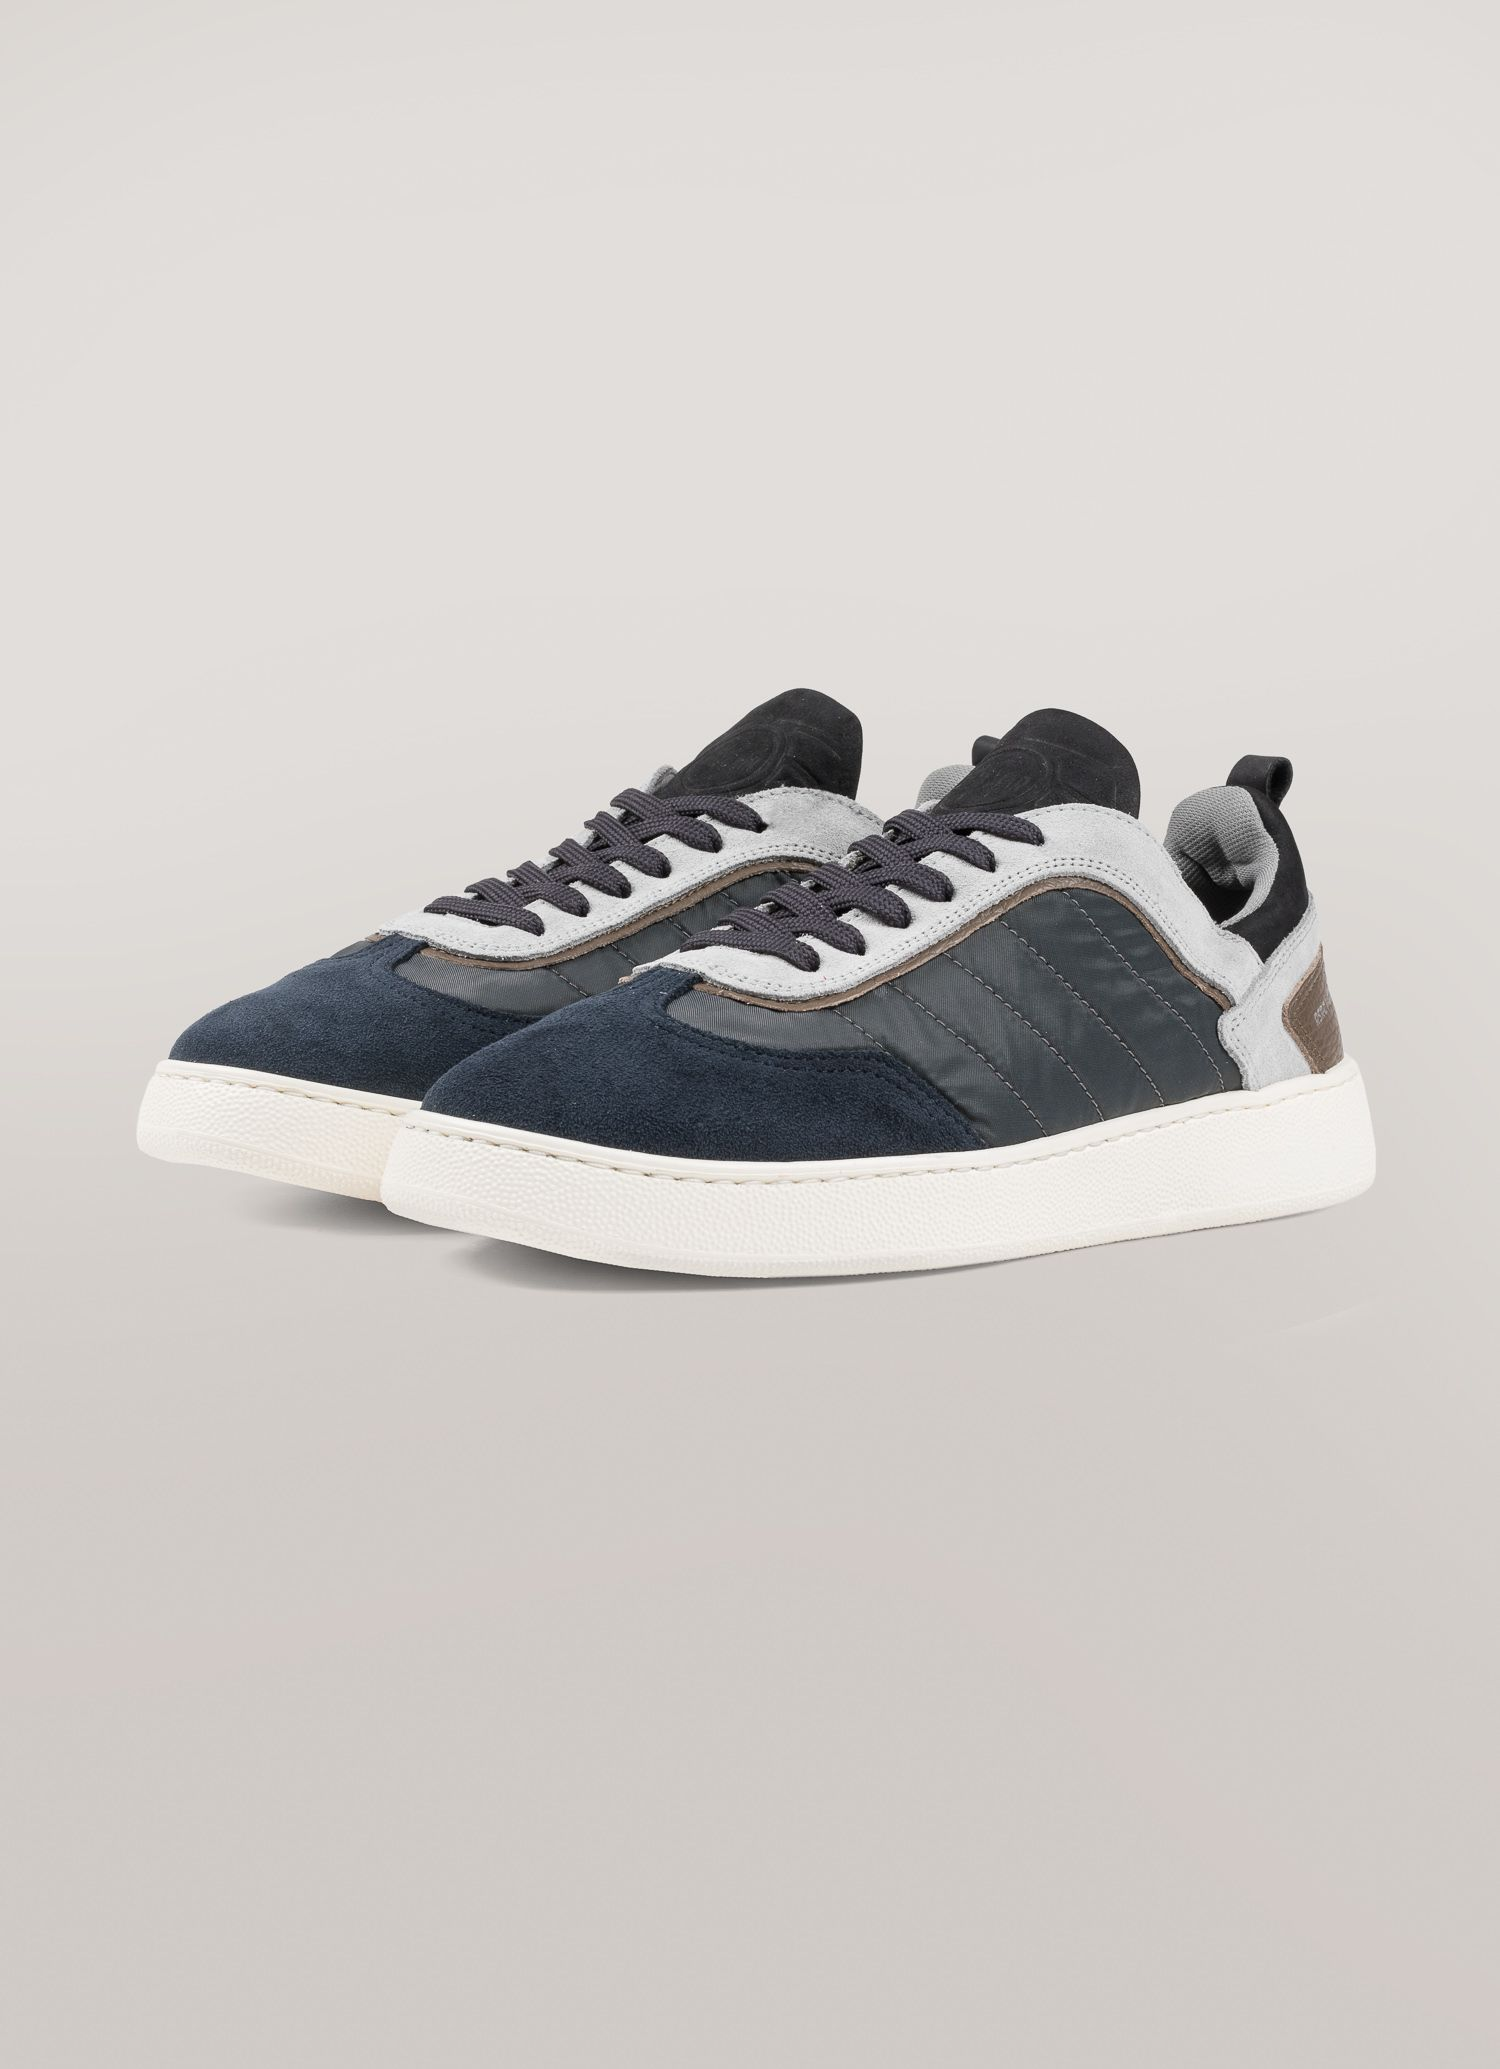 8324493ec92 Colmar originals holden nylon research mens shoes colmar jpg 1500x2069  Holden skate shoes